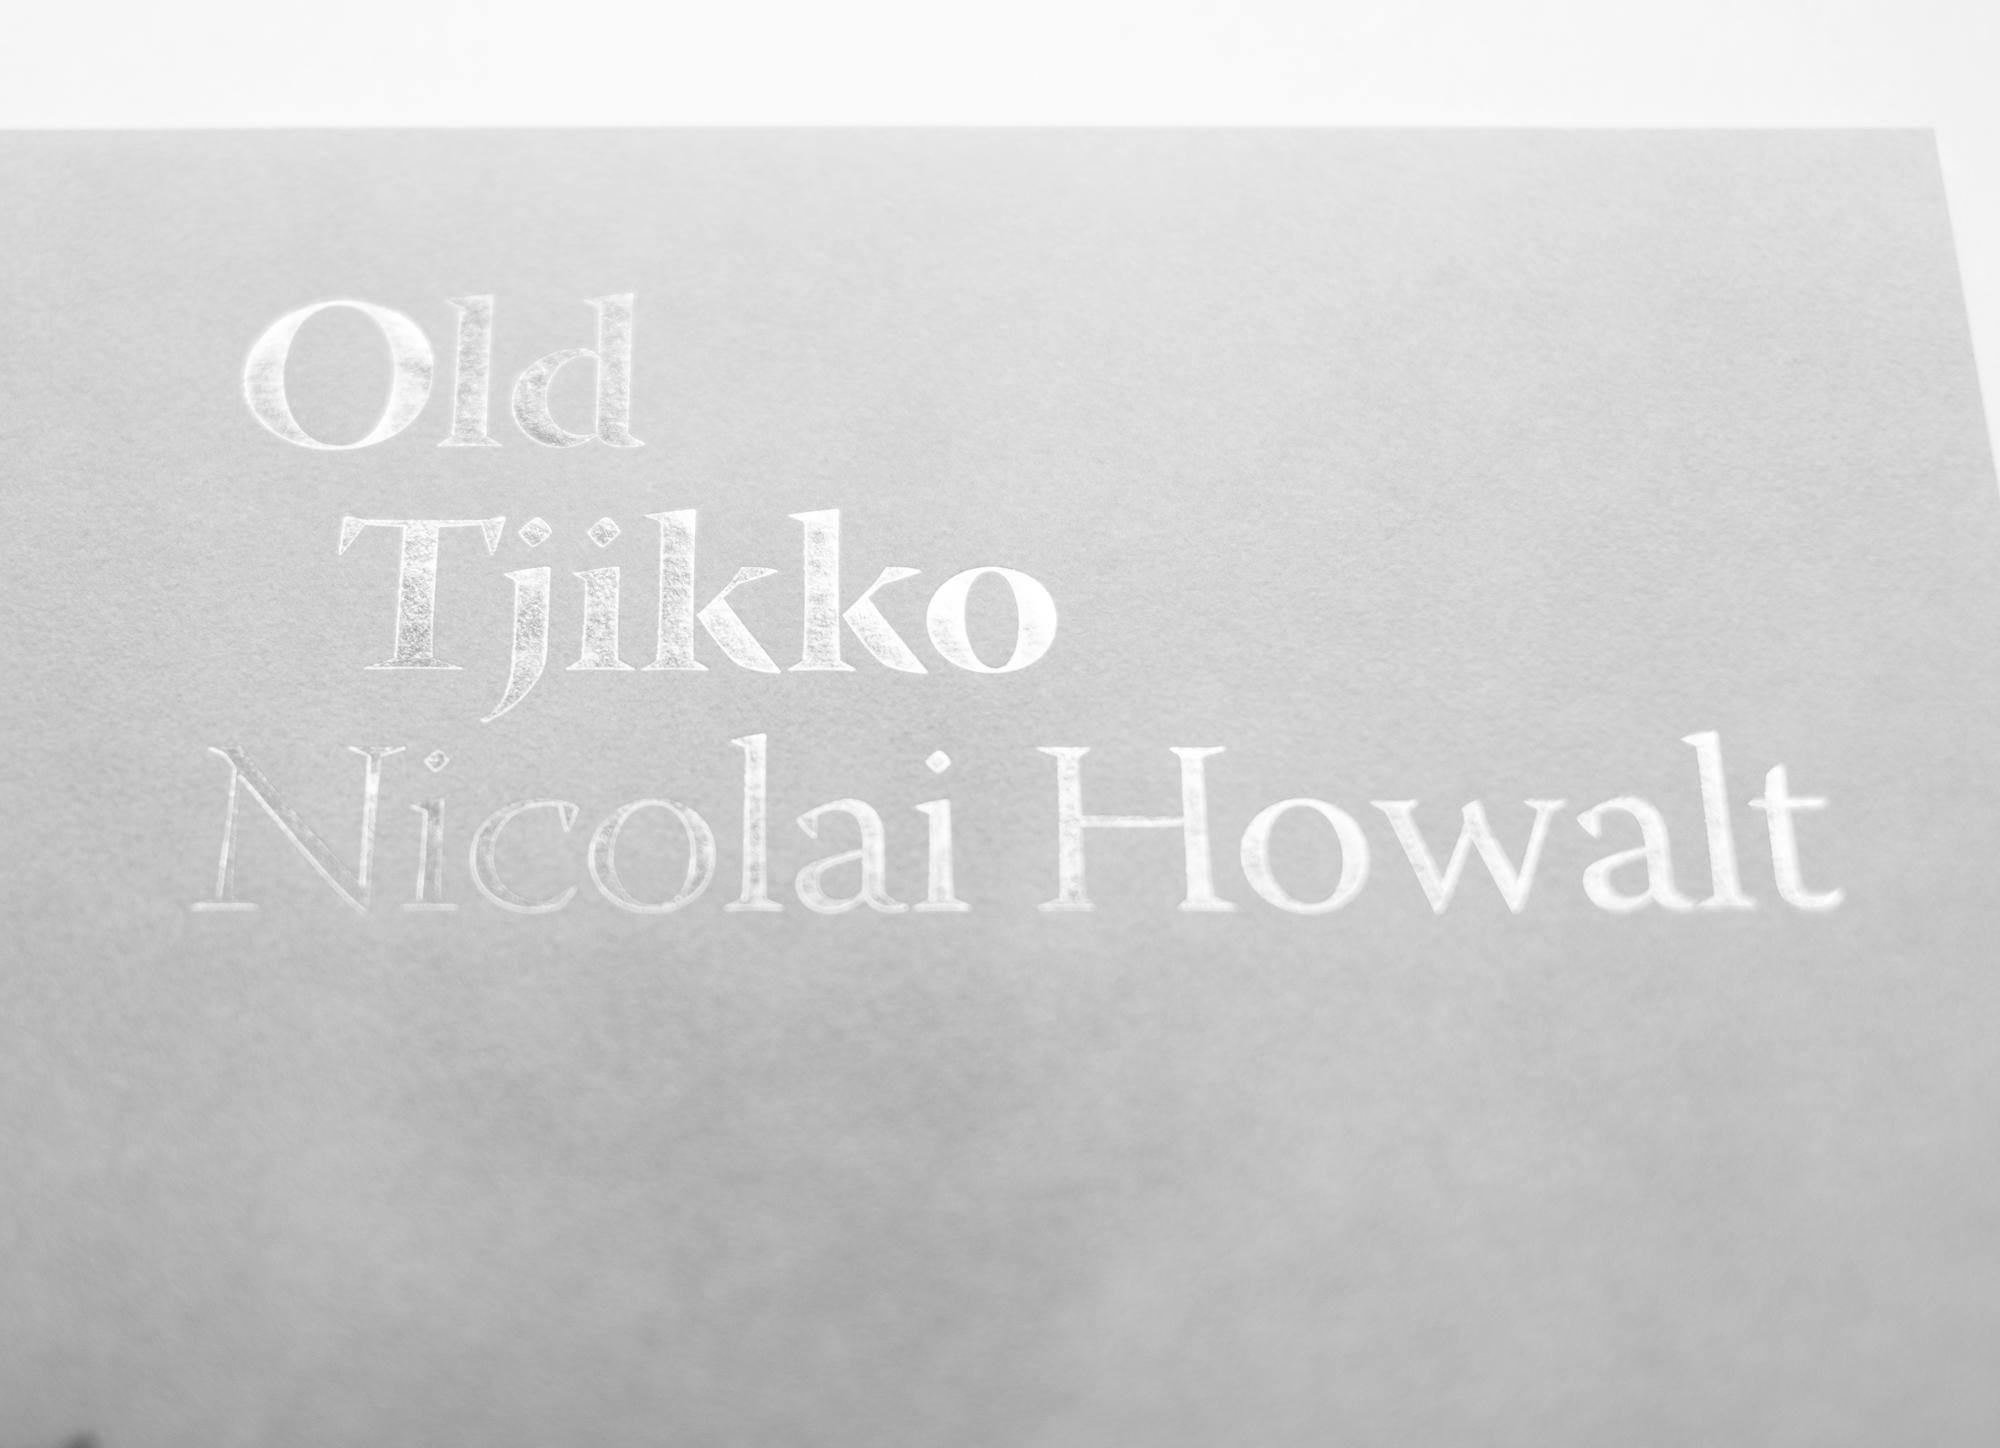 Detail of silver foil imprint on Old Tjikko Poster by Nicolai Howalt